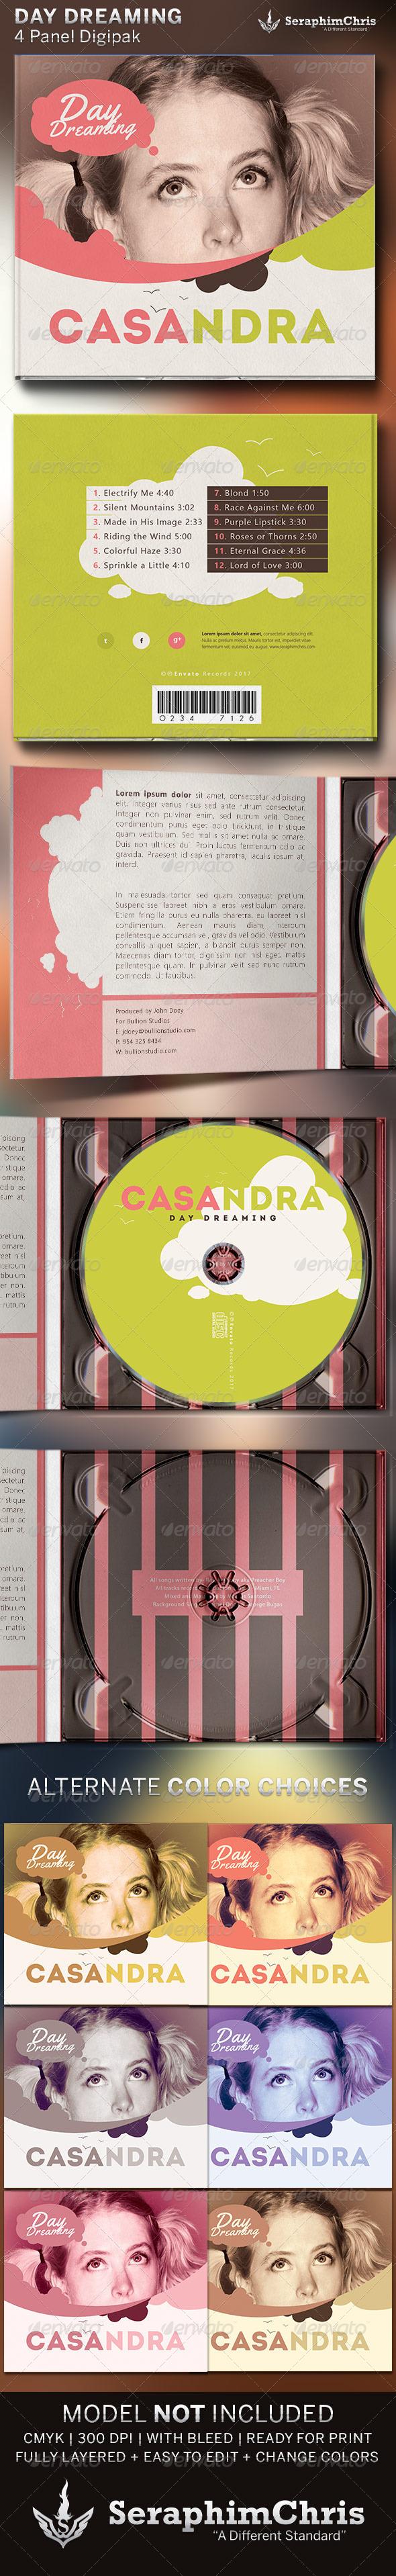 Daydream: Digipak CD Cover Artwork Template - CD & DVD Artwork Print Templates